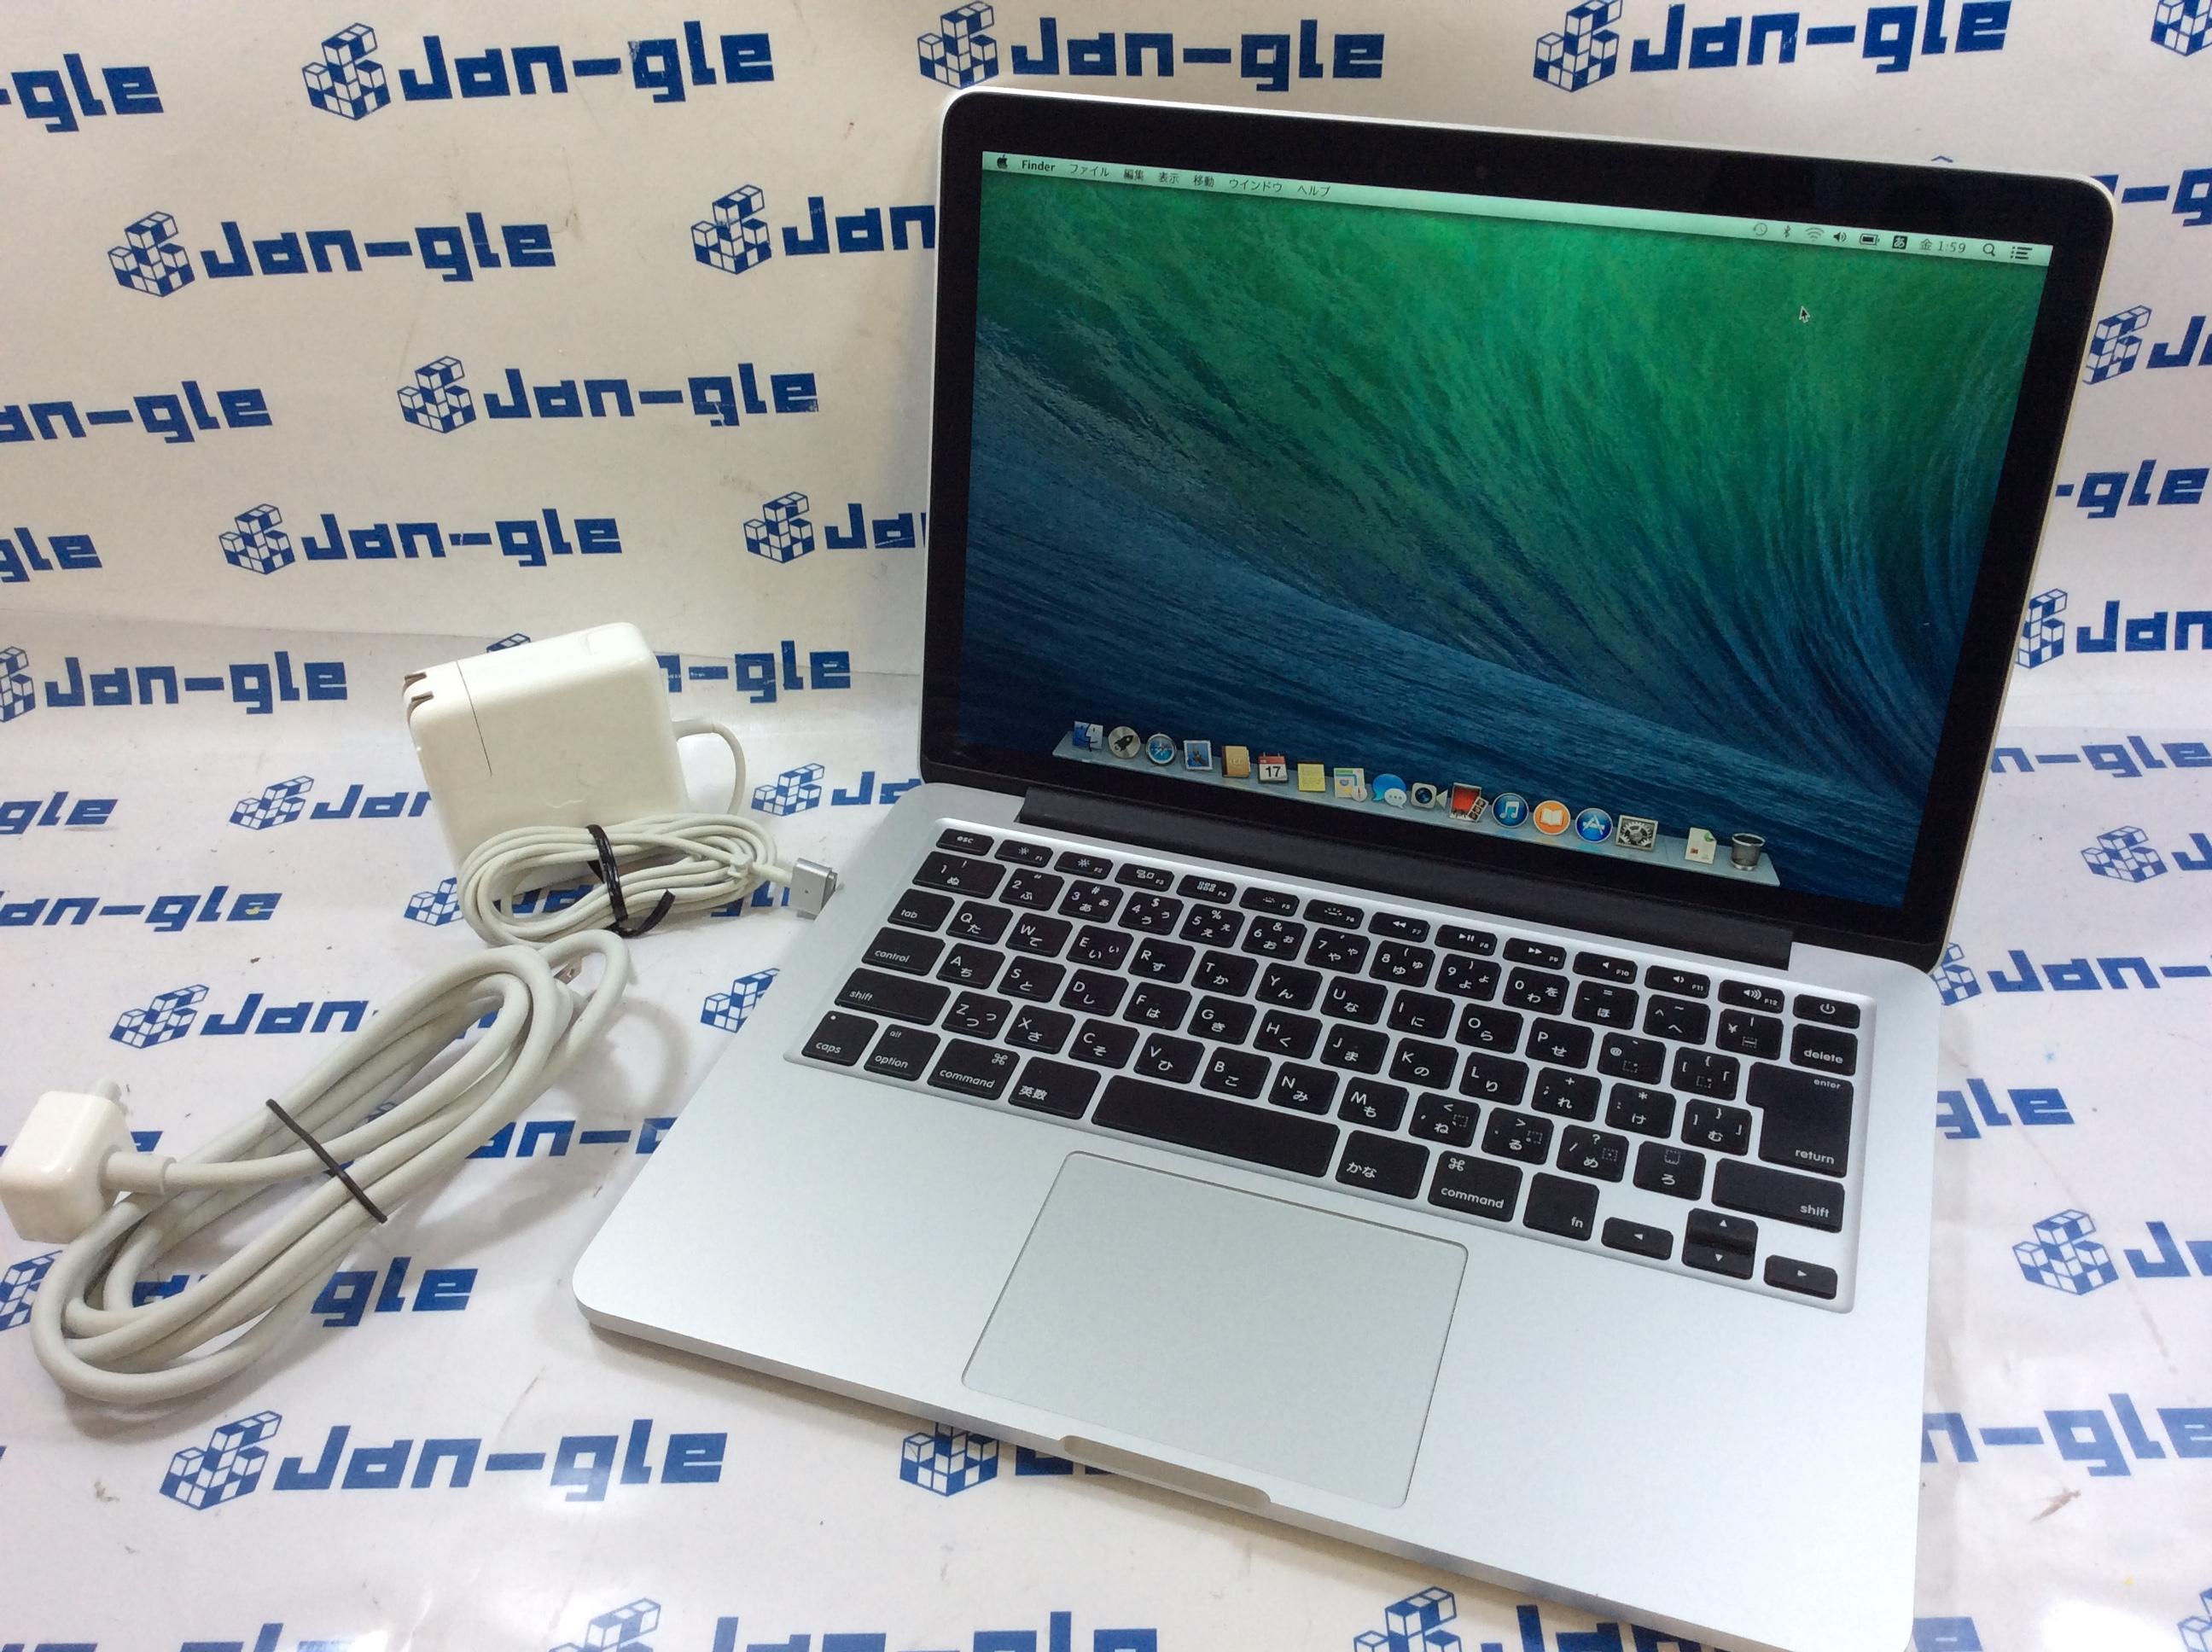 【KS】【中古】Apple MacBook Pro ME864J/A Late2013 13.3インチ Core i5 &SSD 128GB搭載!